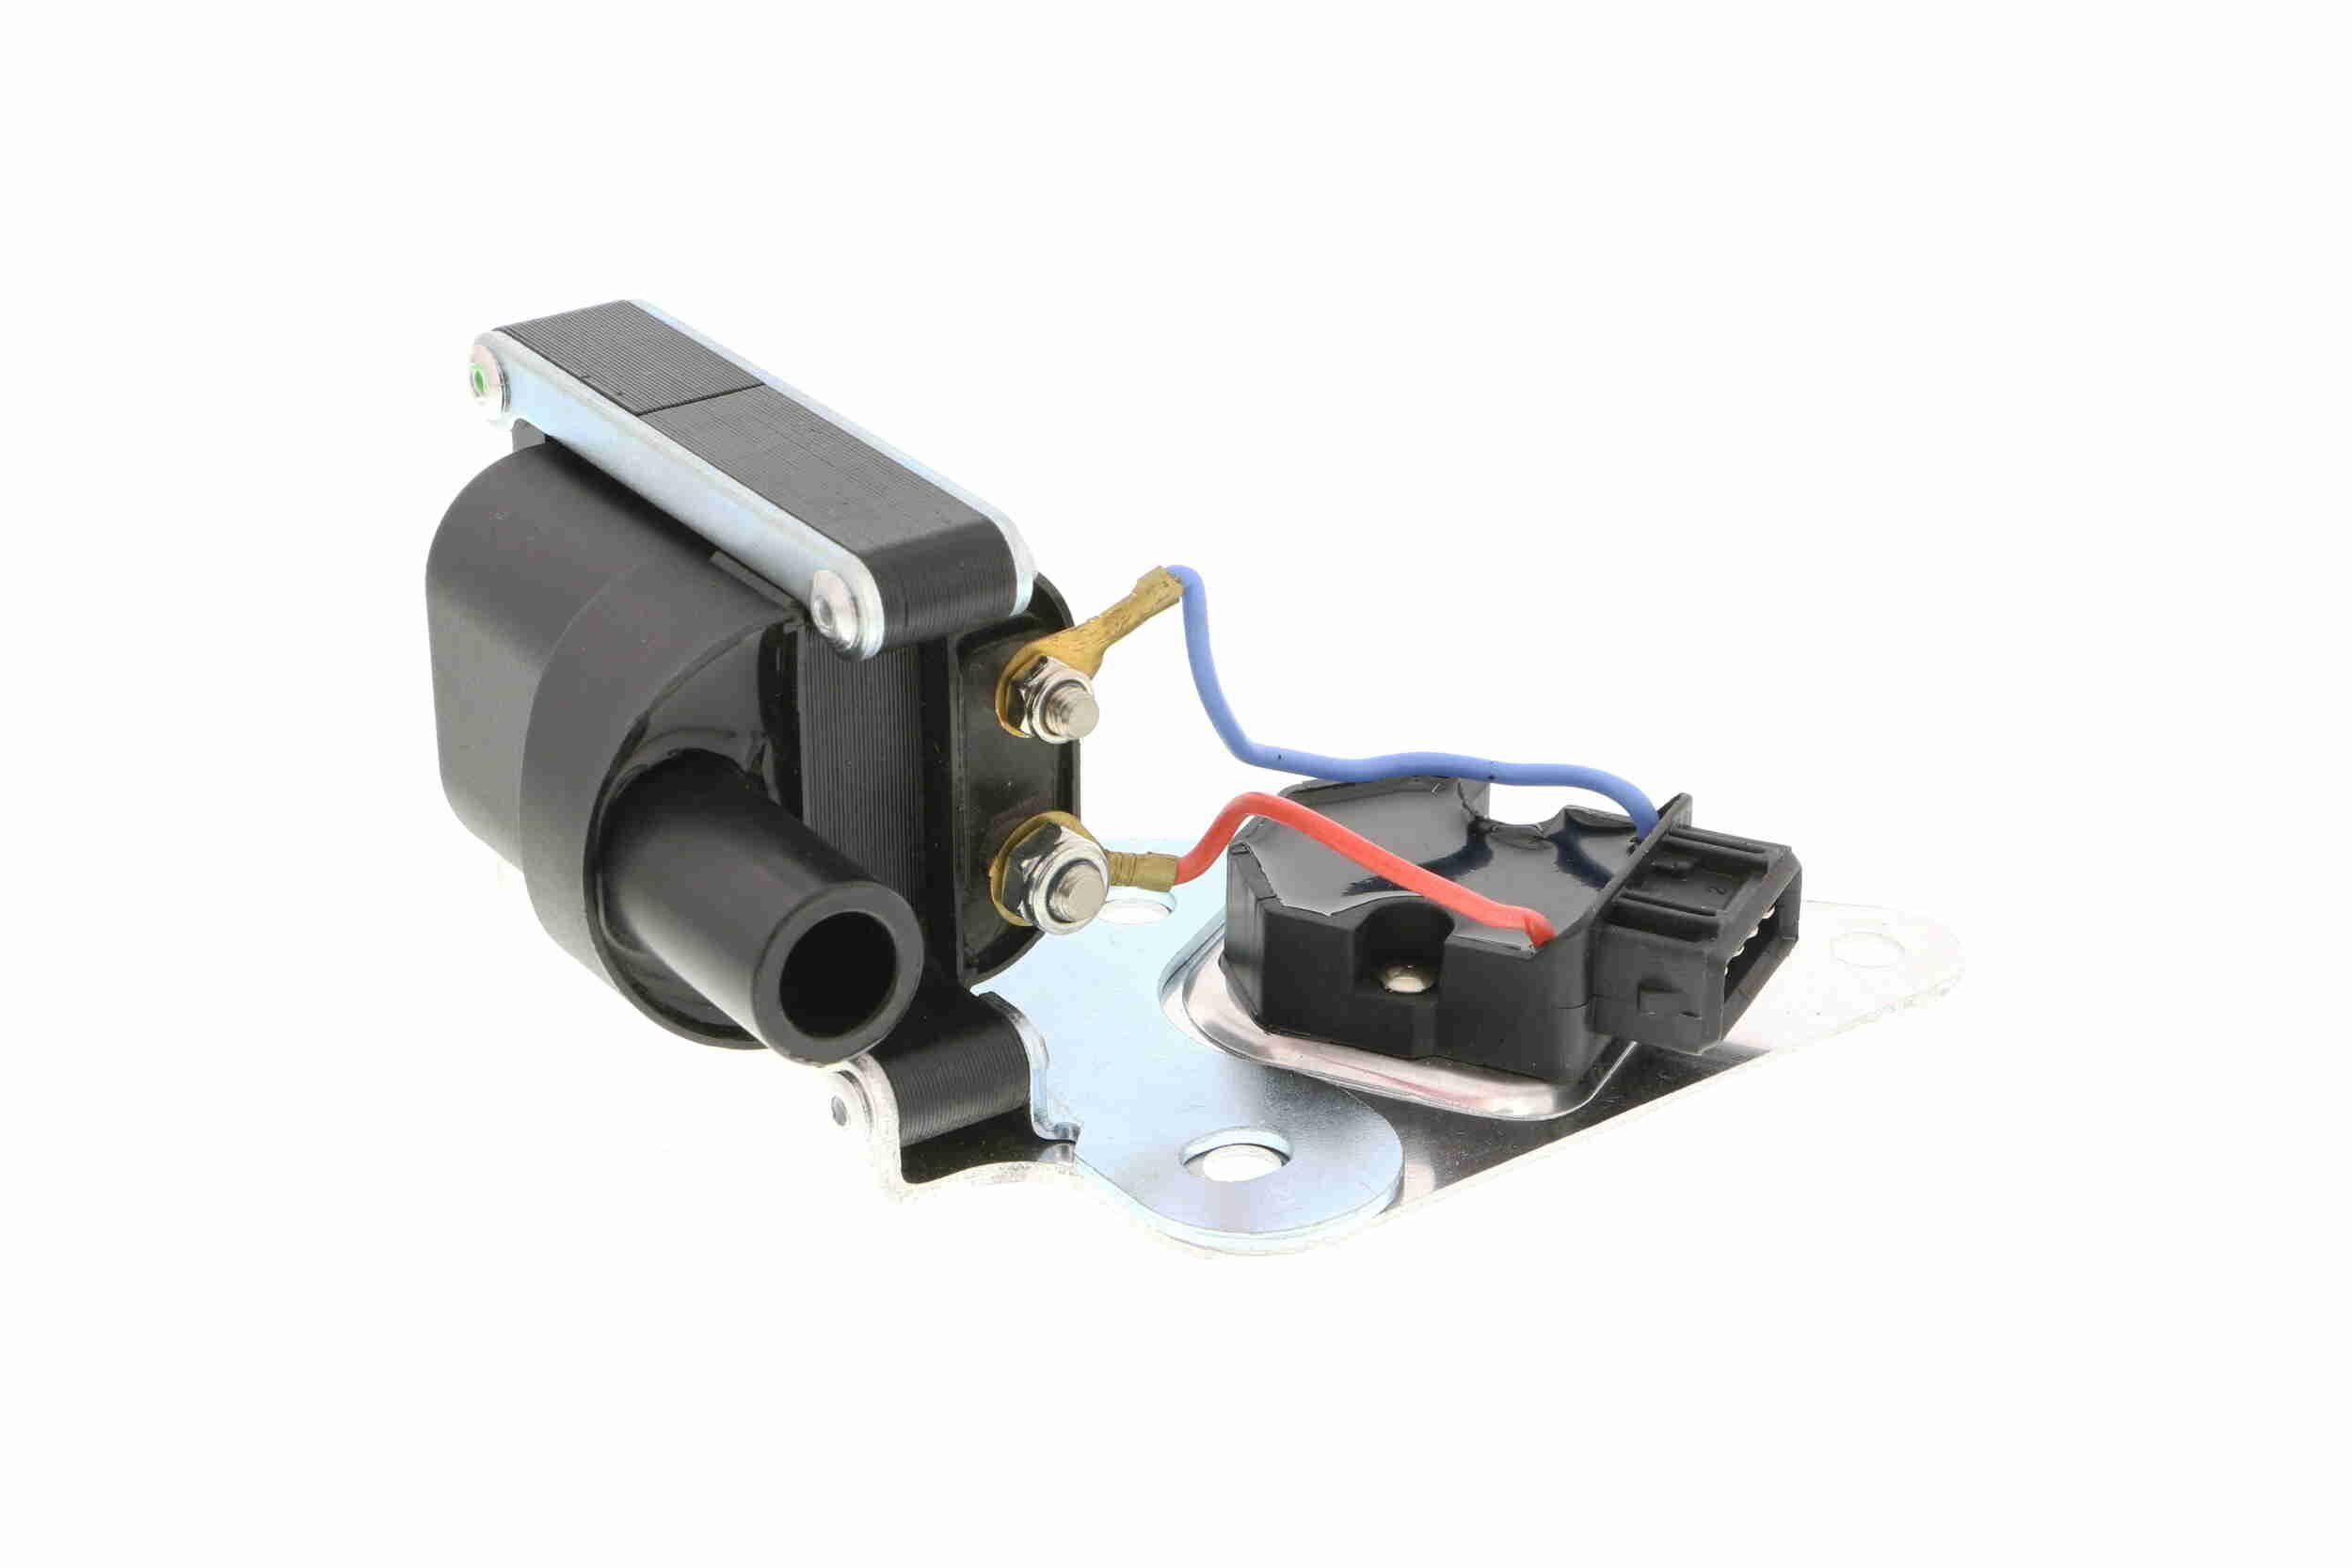 Zündspule V95-70-0001 VEMO V95-70-0001 in Original Qualität